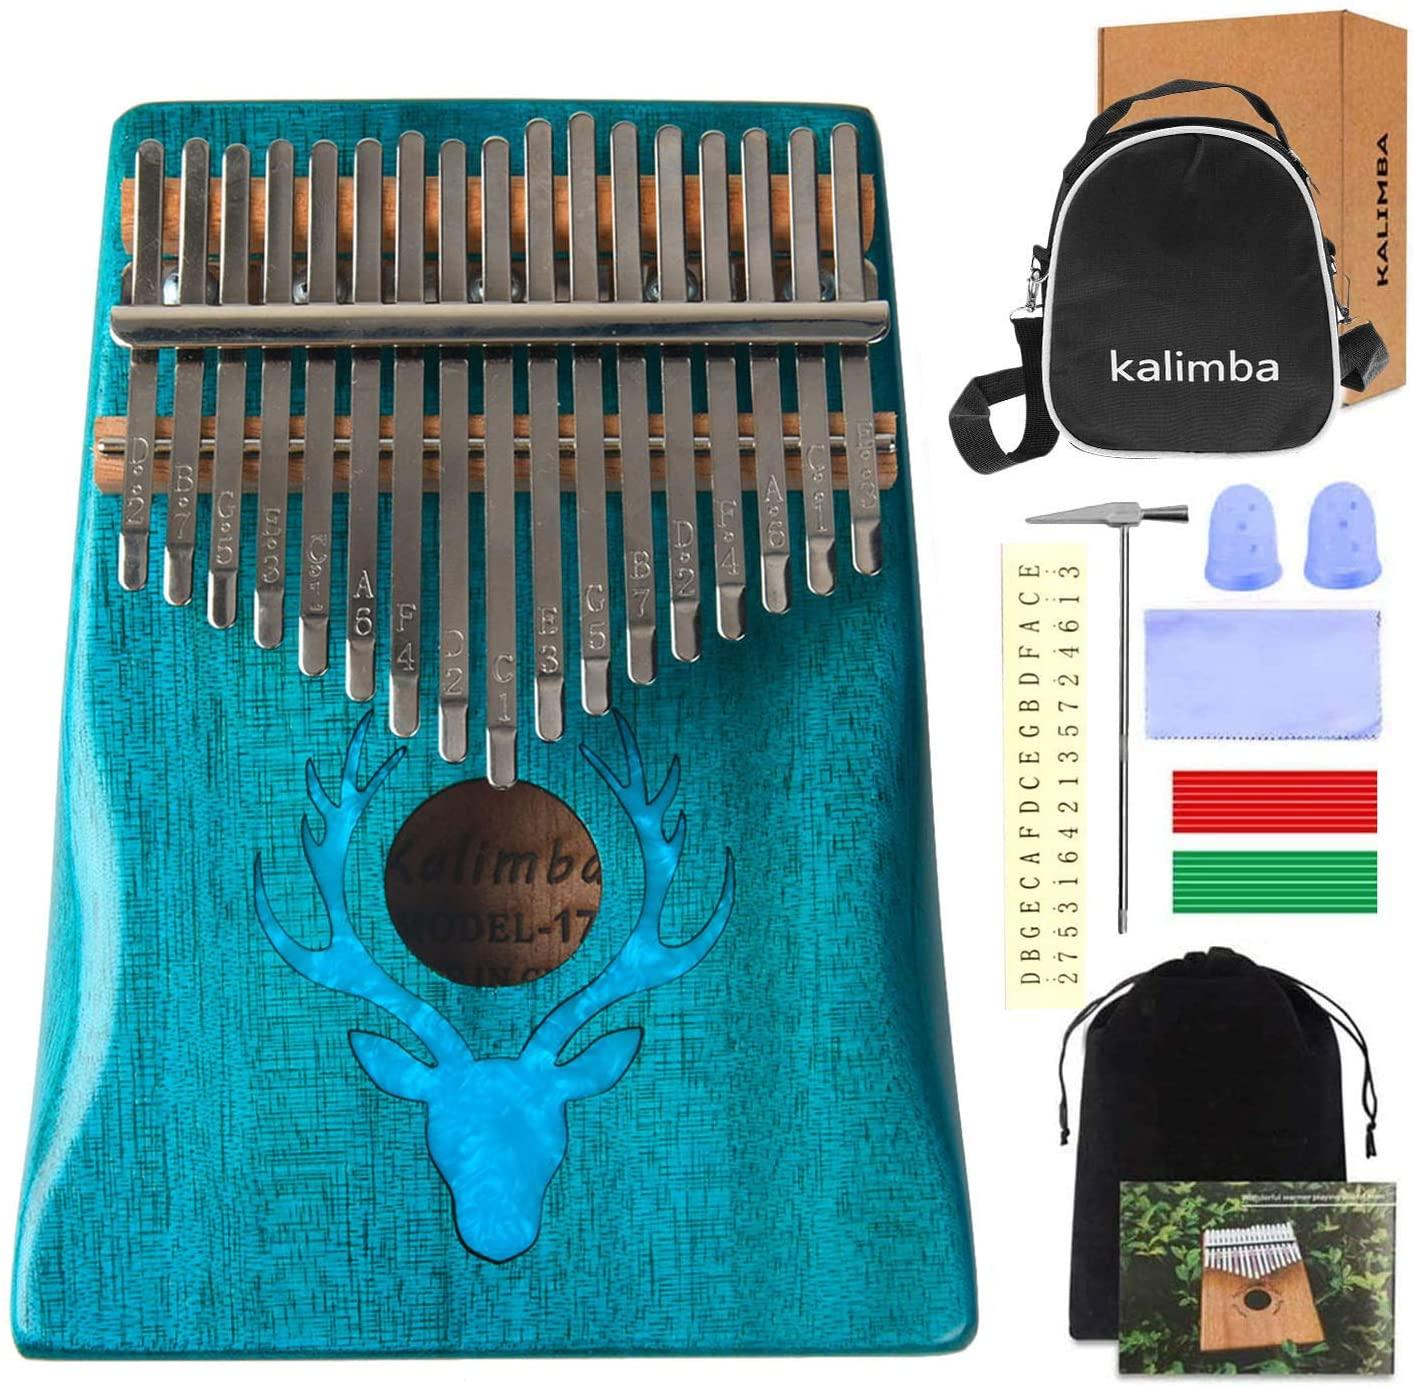 Kalimba Thumb Piano 17 Keys Portable Mbira Sanza Finger Piano Mahogany Wood Body Animal Pattern Gifts for Kids and Adults Beginners (Style B)